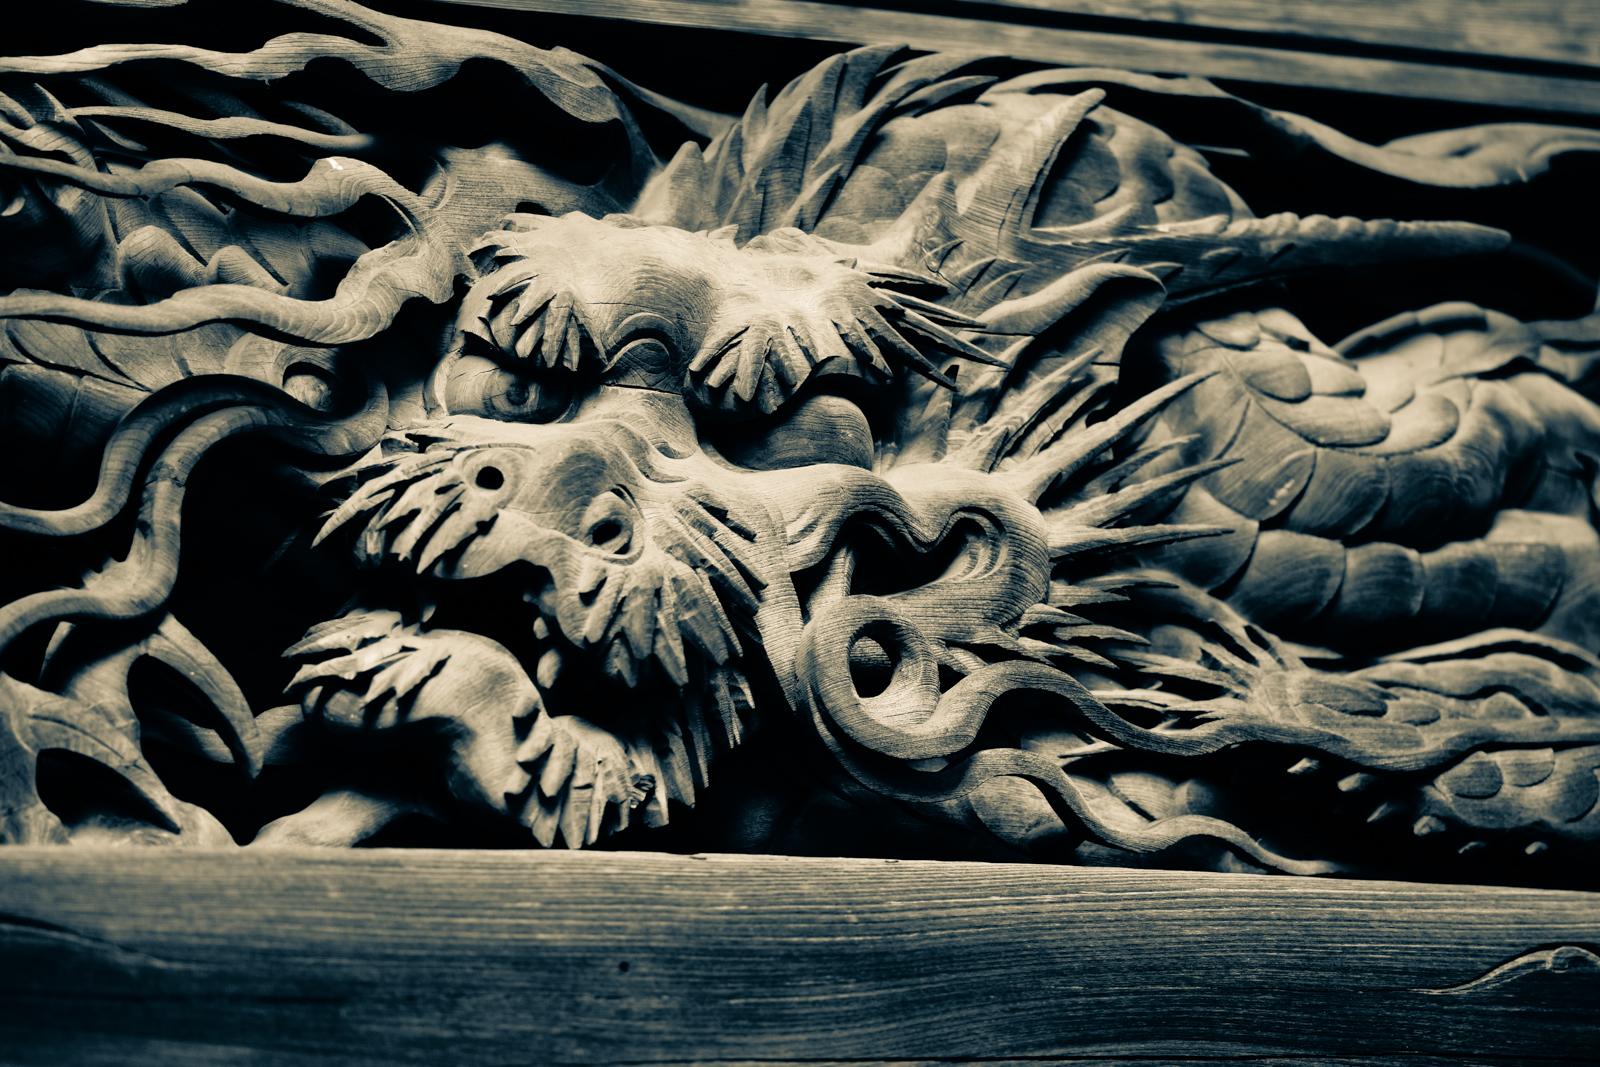 武蔵國分寺本殿、龍の装飾の写真